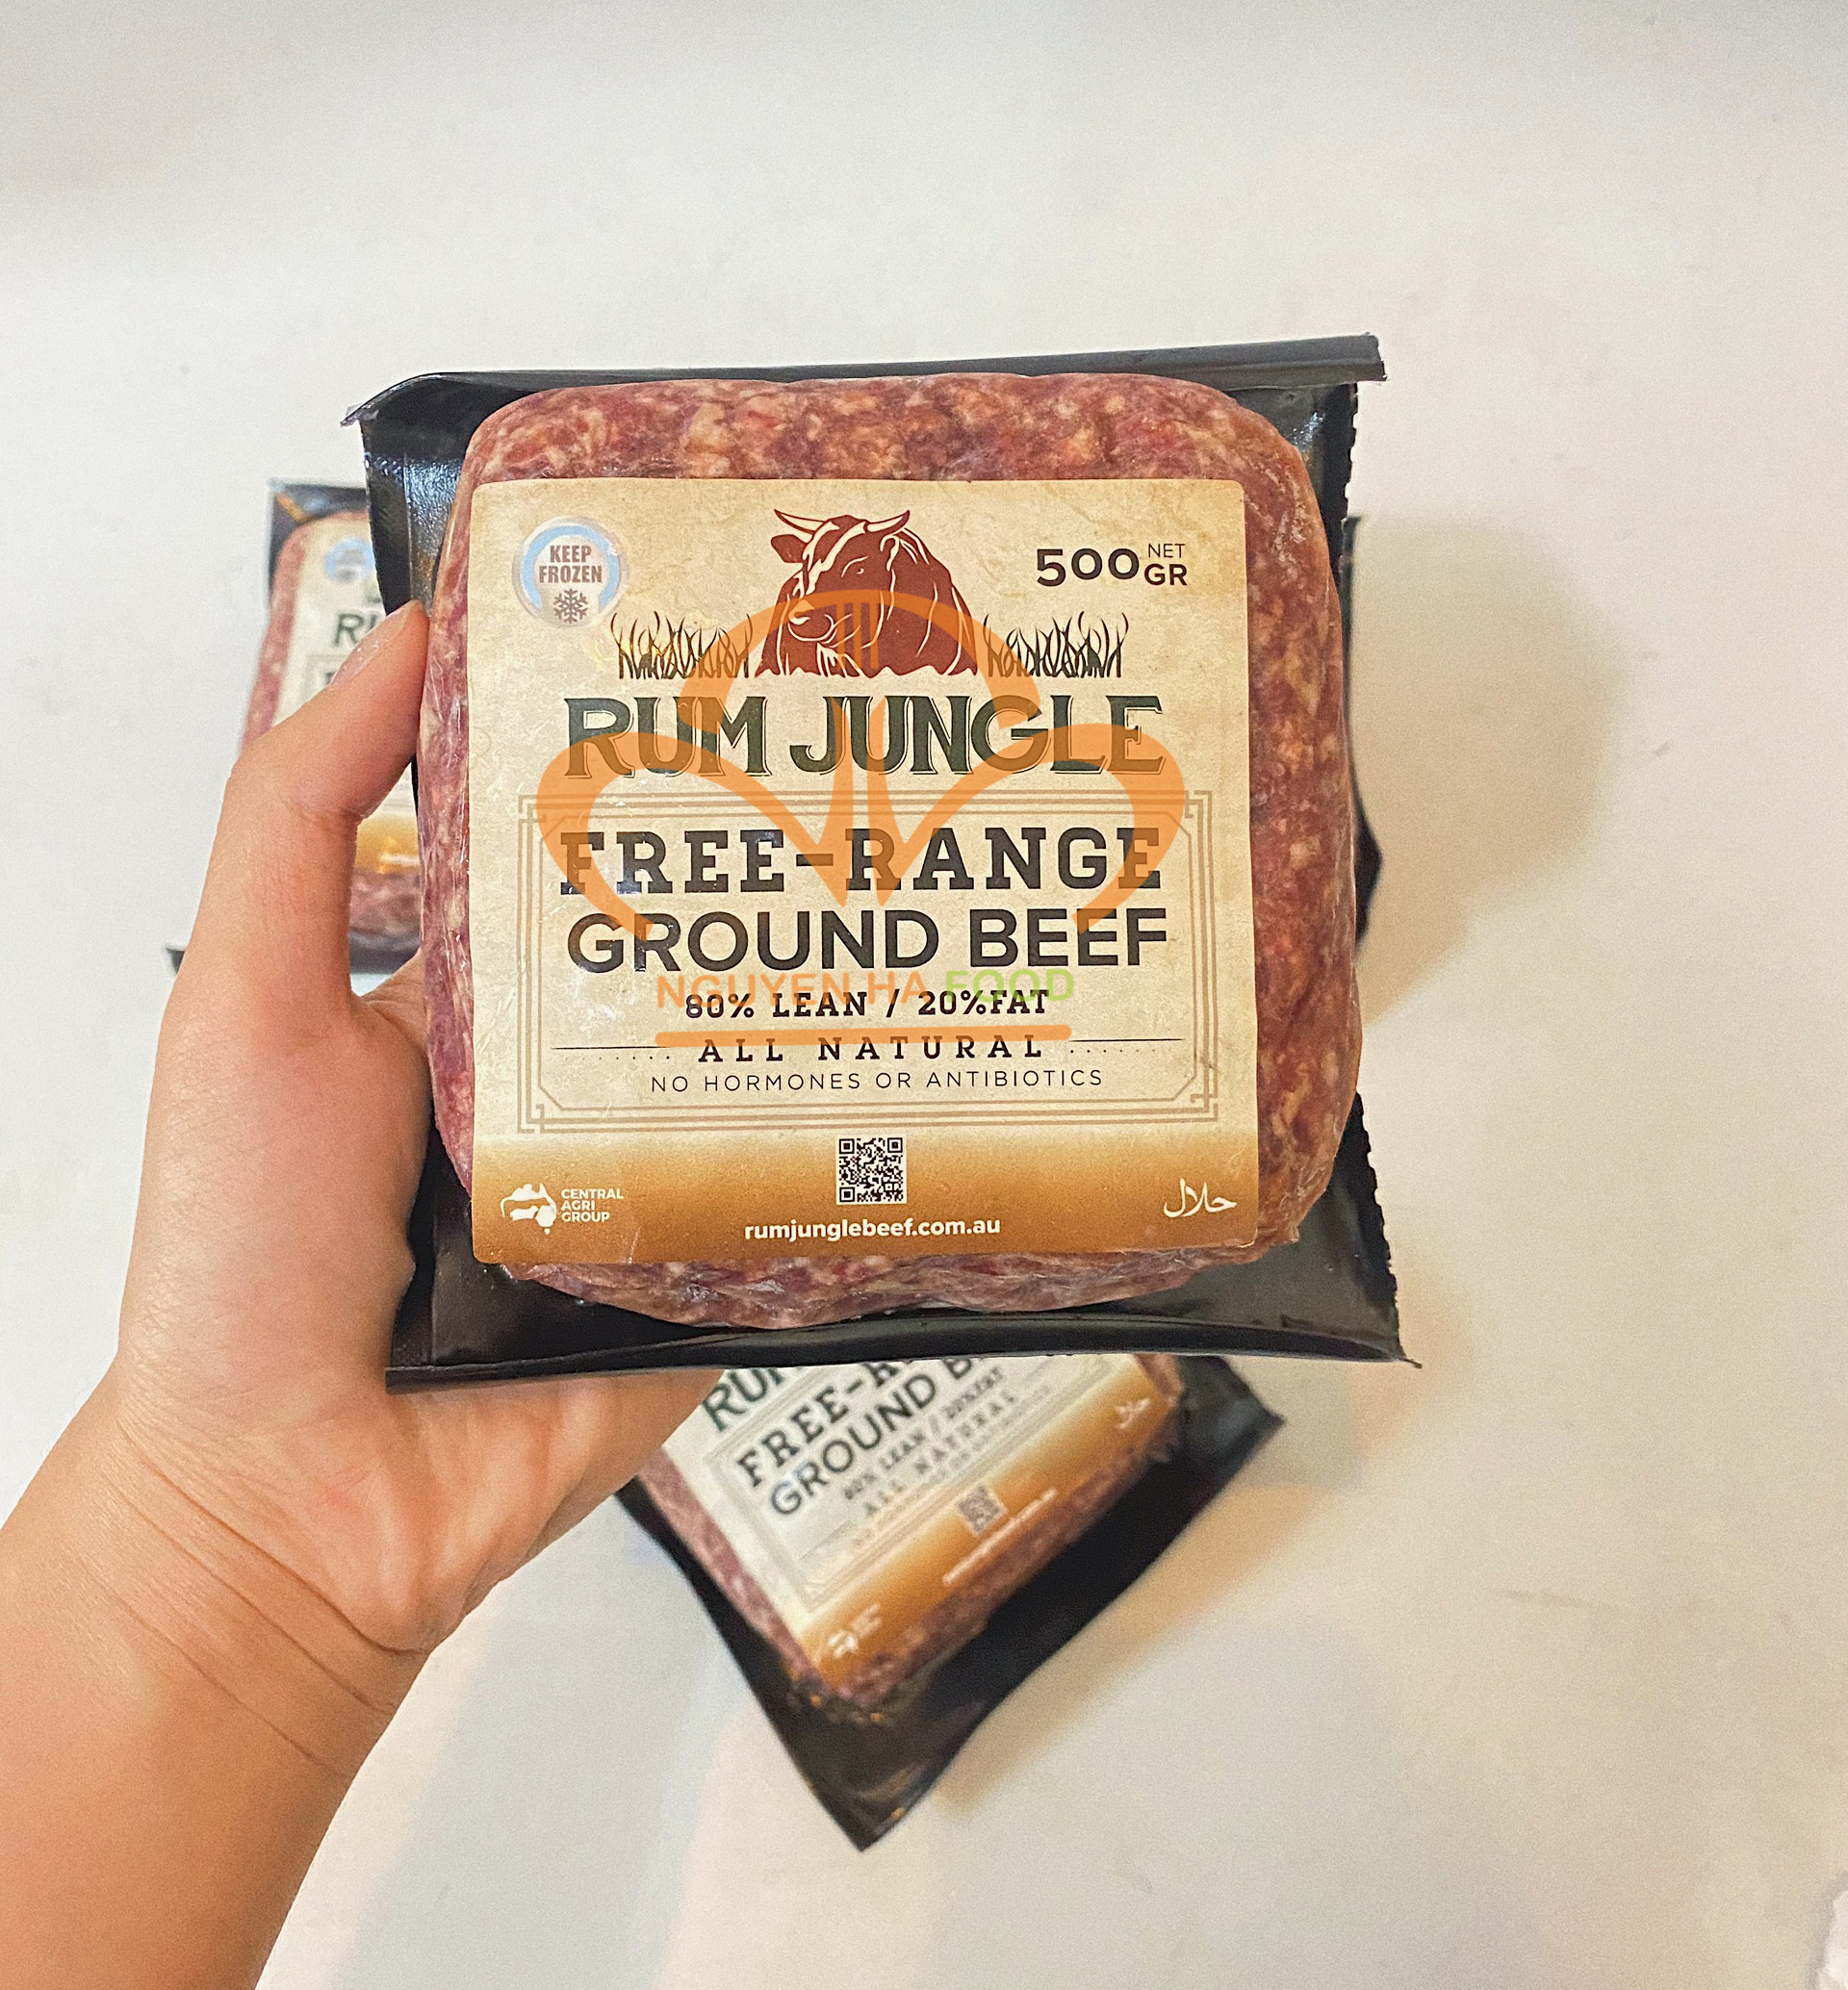 bo uc xay rum jungle 500g nguyen ha food (1)